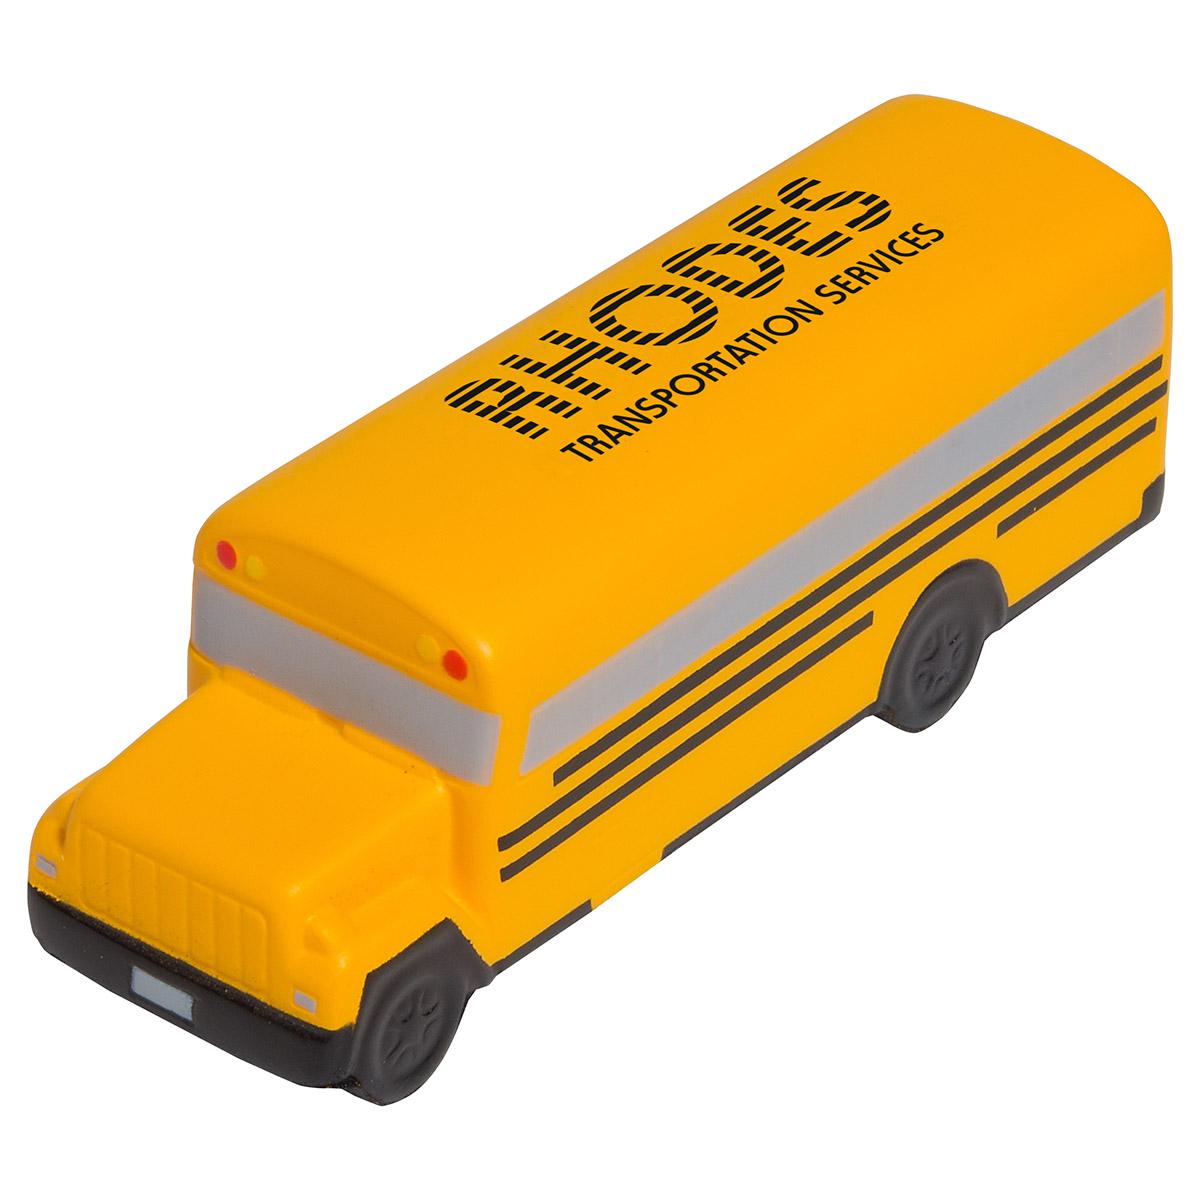 Conventional School Bus Stress Reliever, LED-SB23 - 1 Colour Imprint